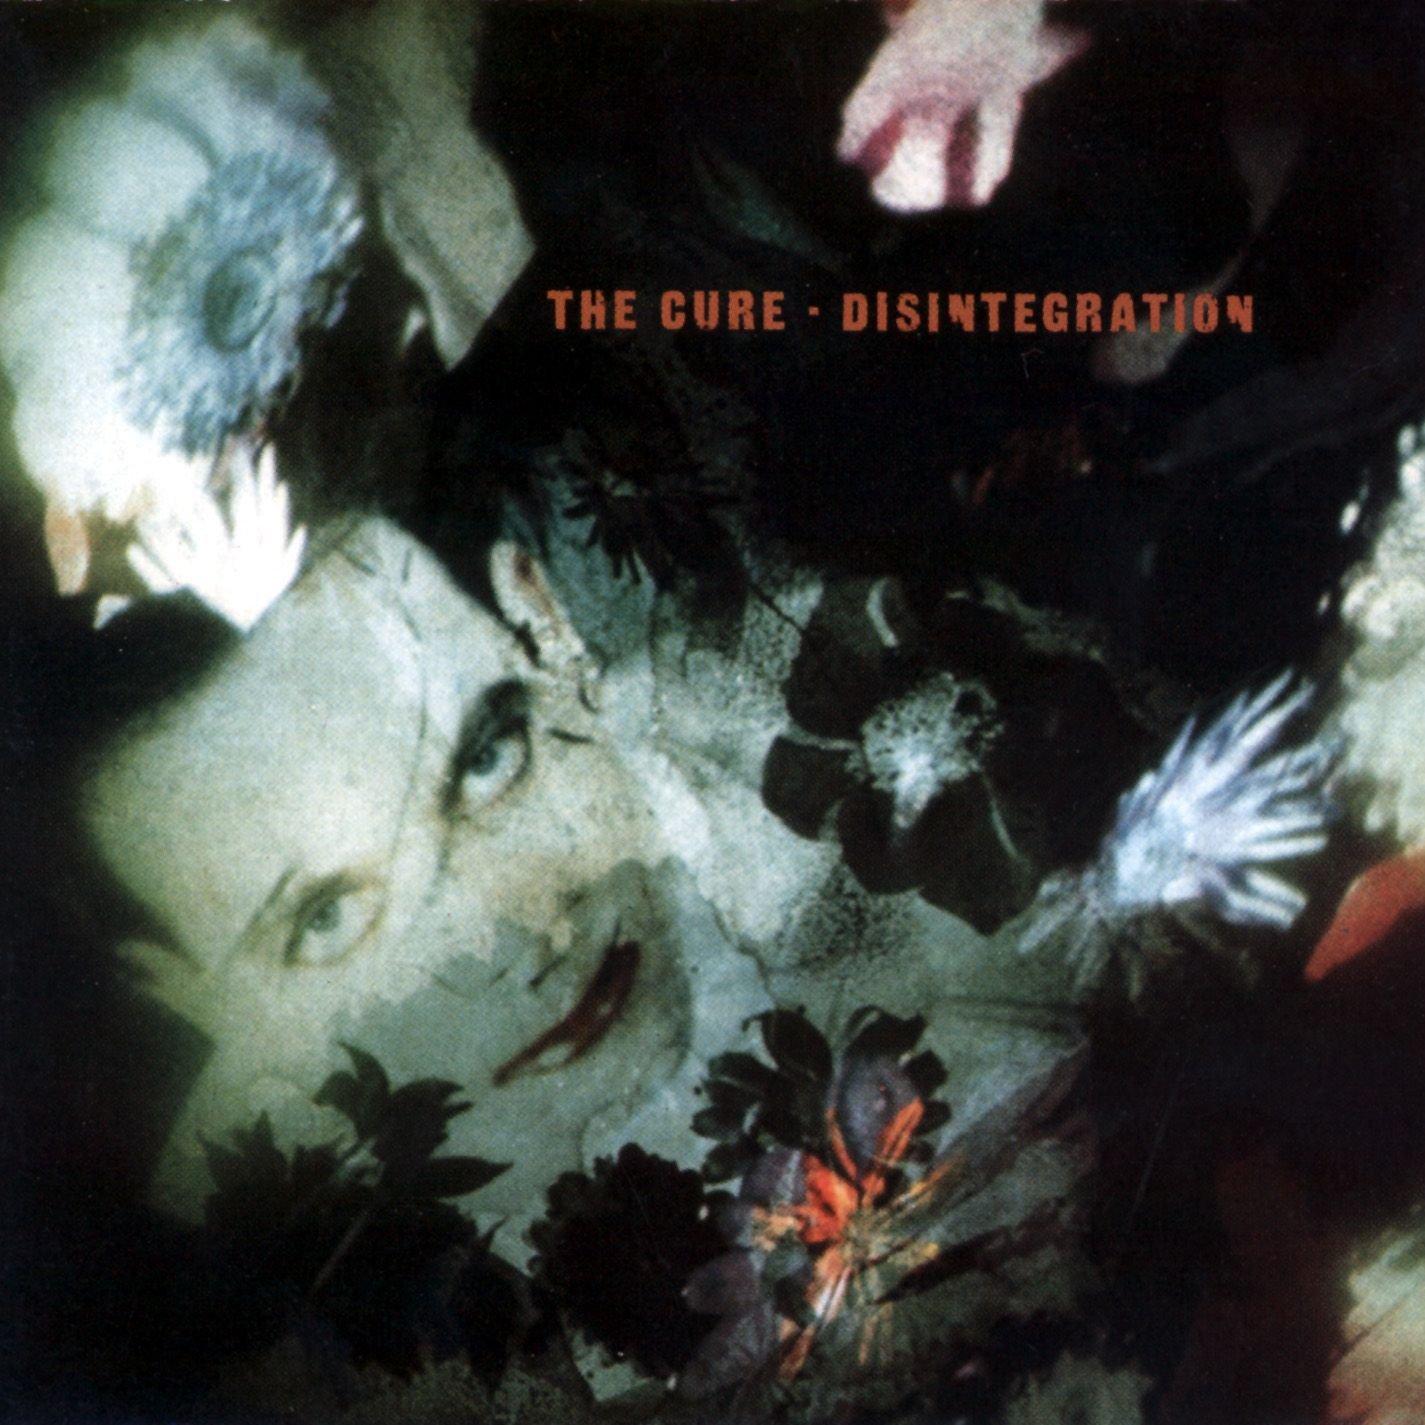 The Cure - Disintegration - Amazon.com Music